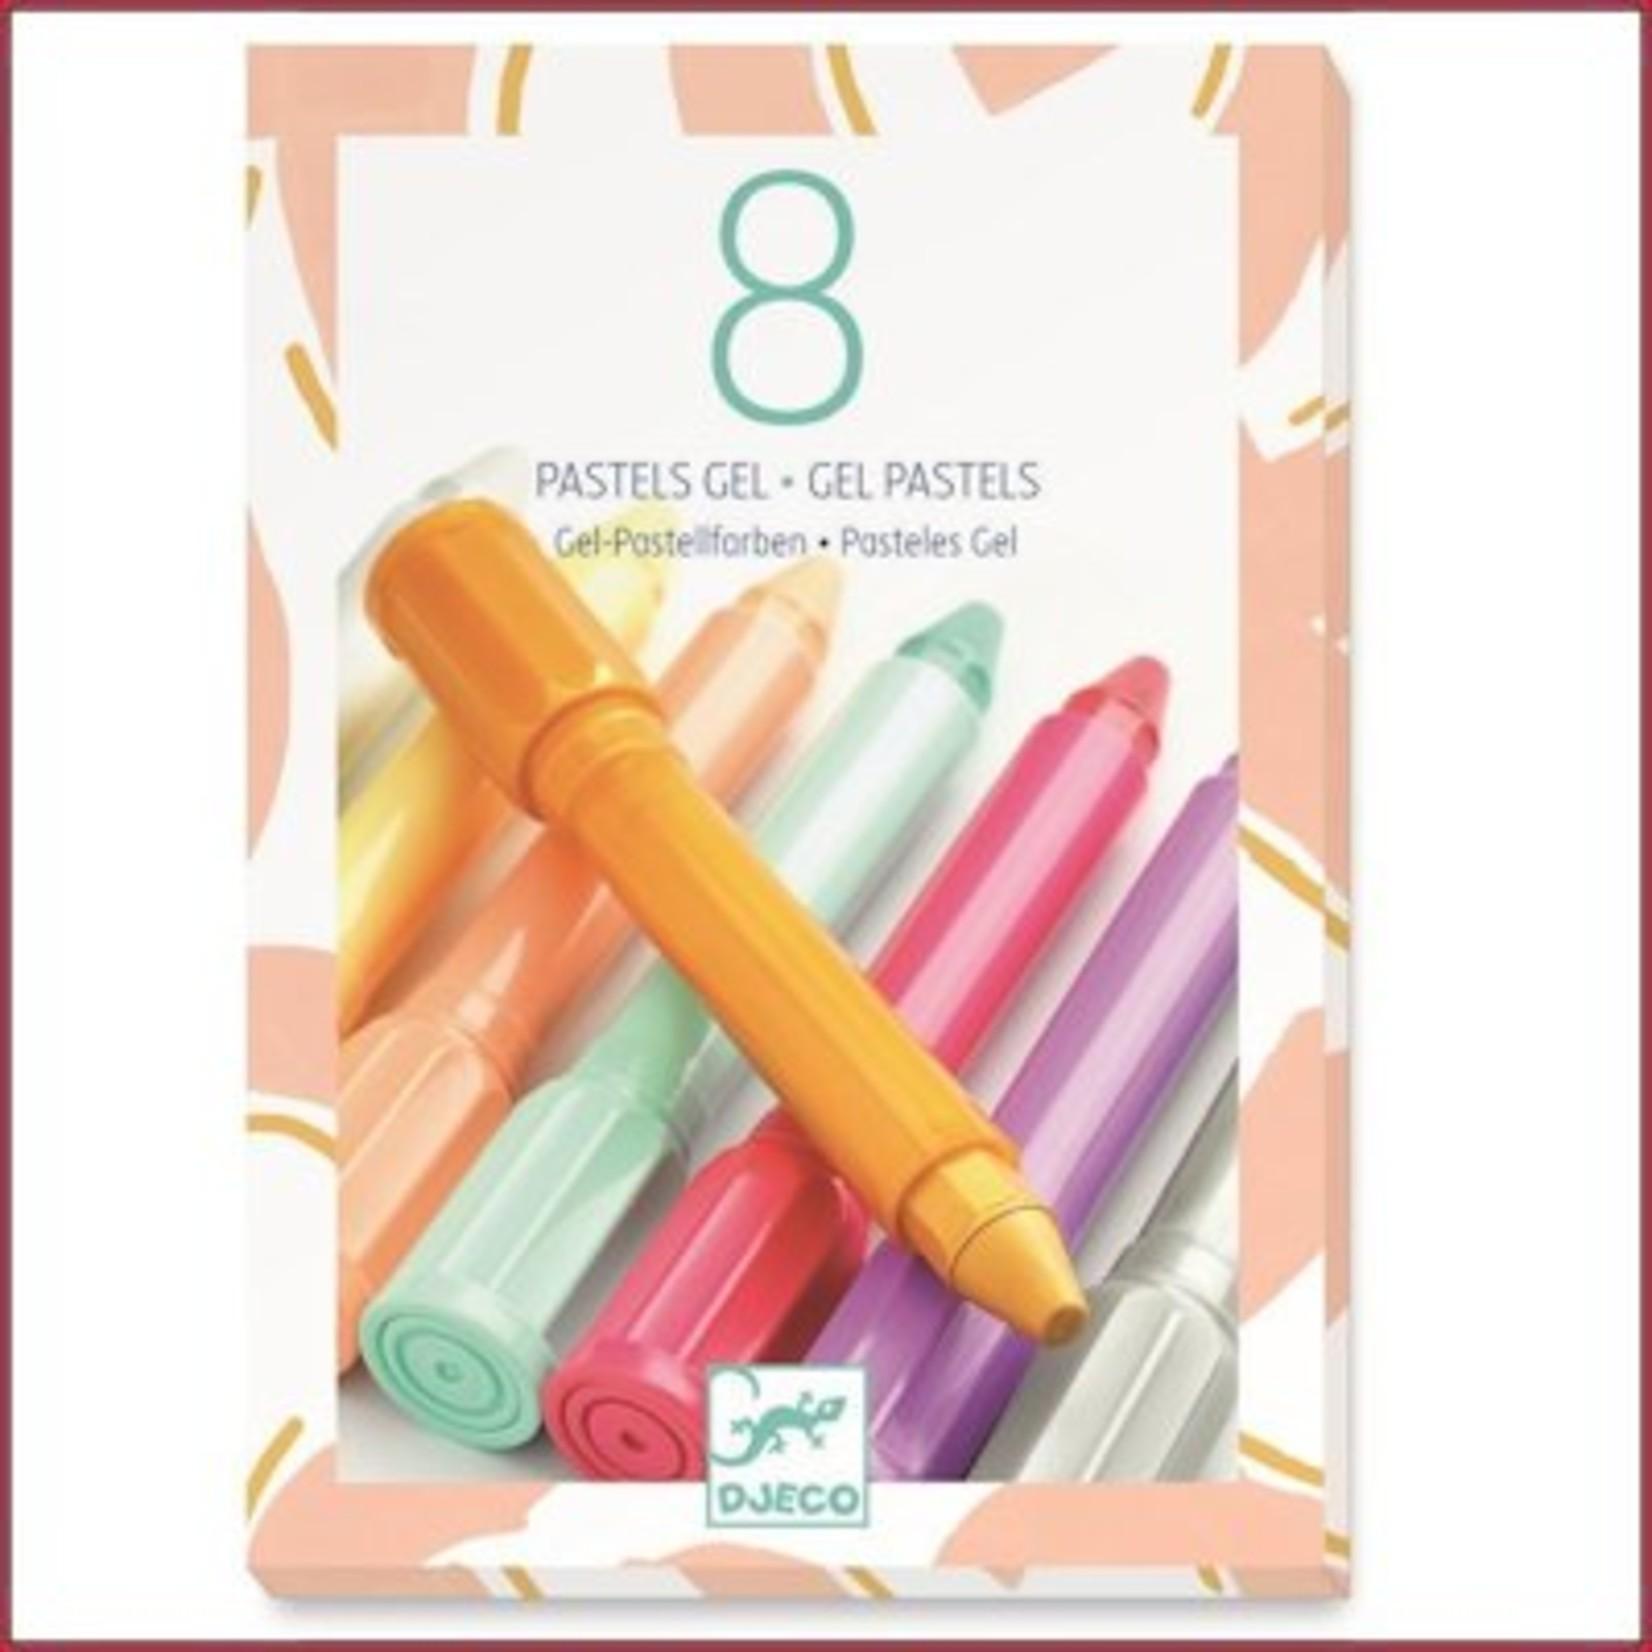 Djeco 8 Gel Pastels Sweet Colours